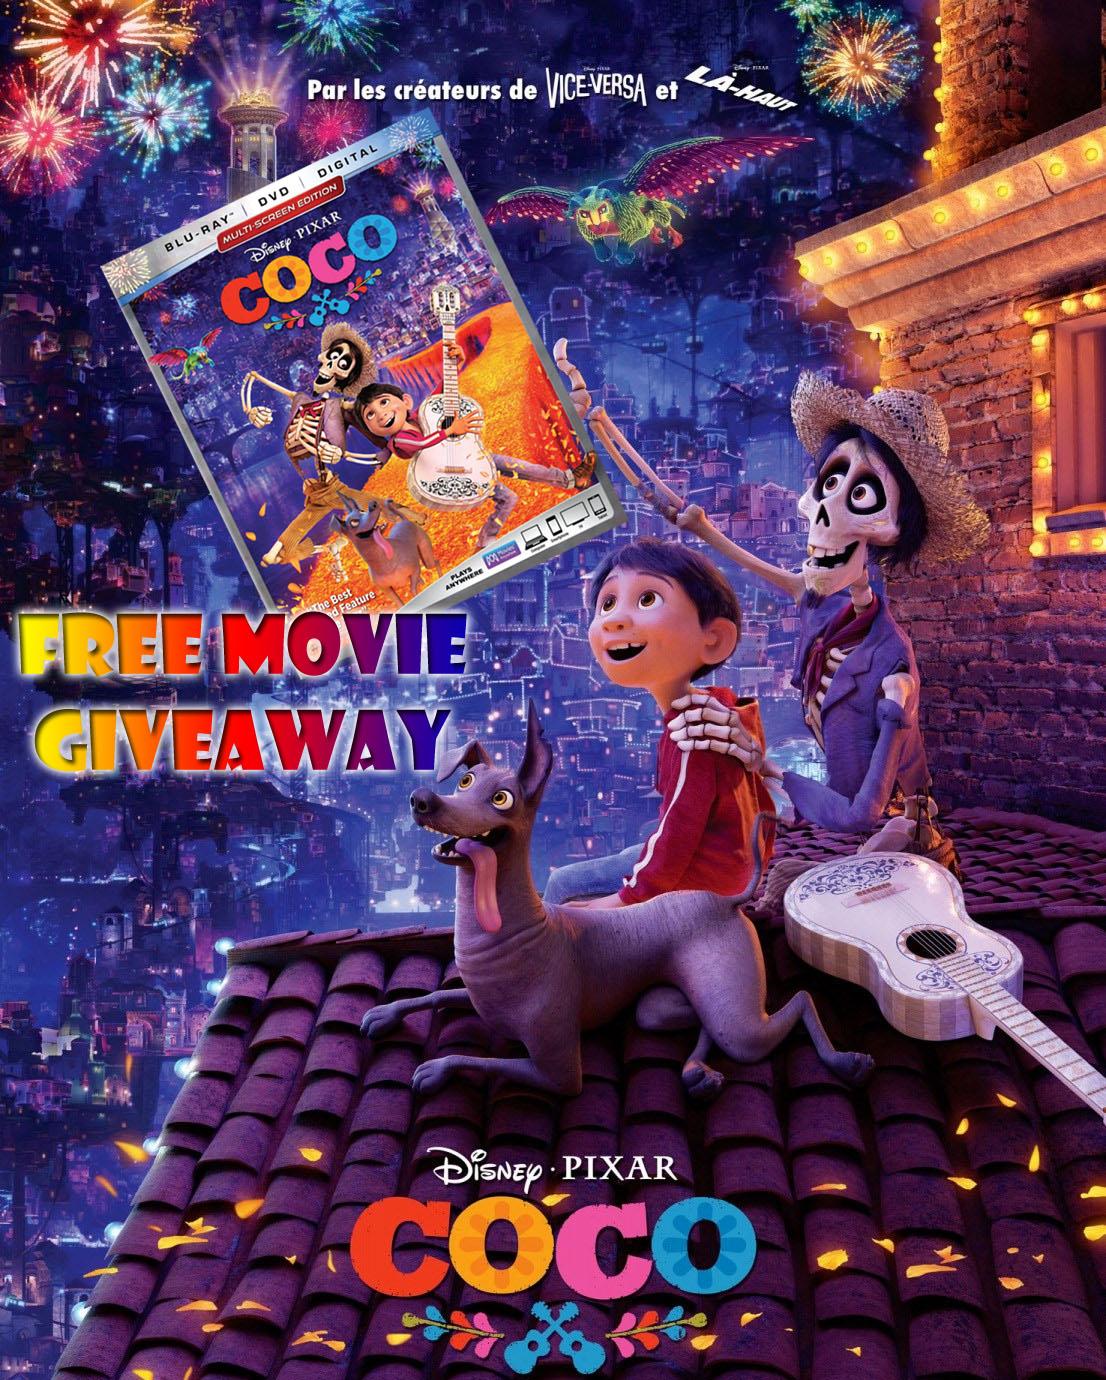 Disney-PIXAR COCO Movie Giveaway